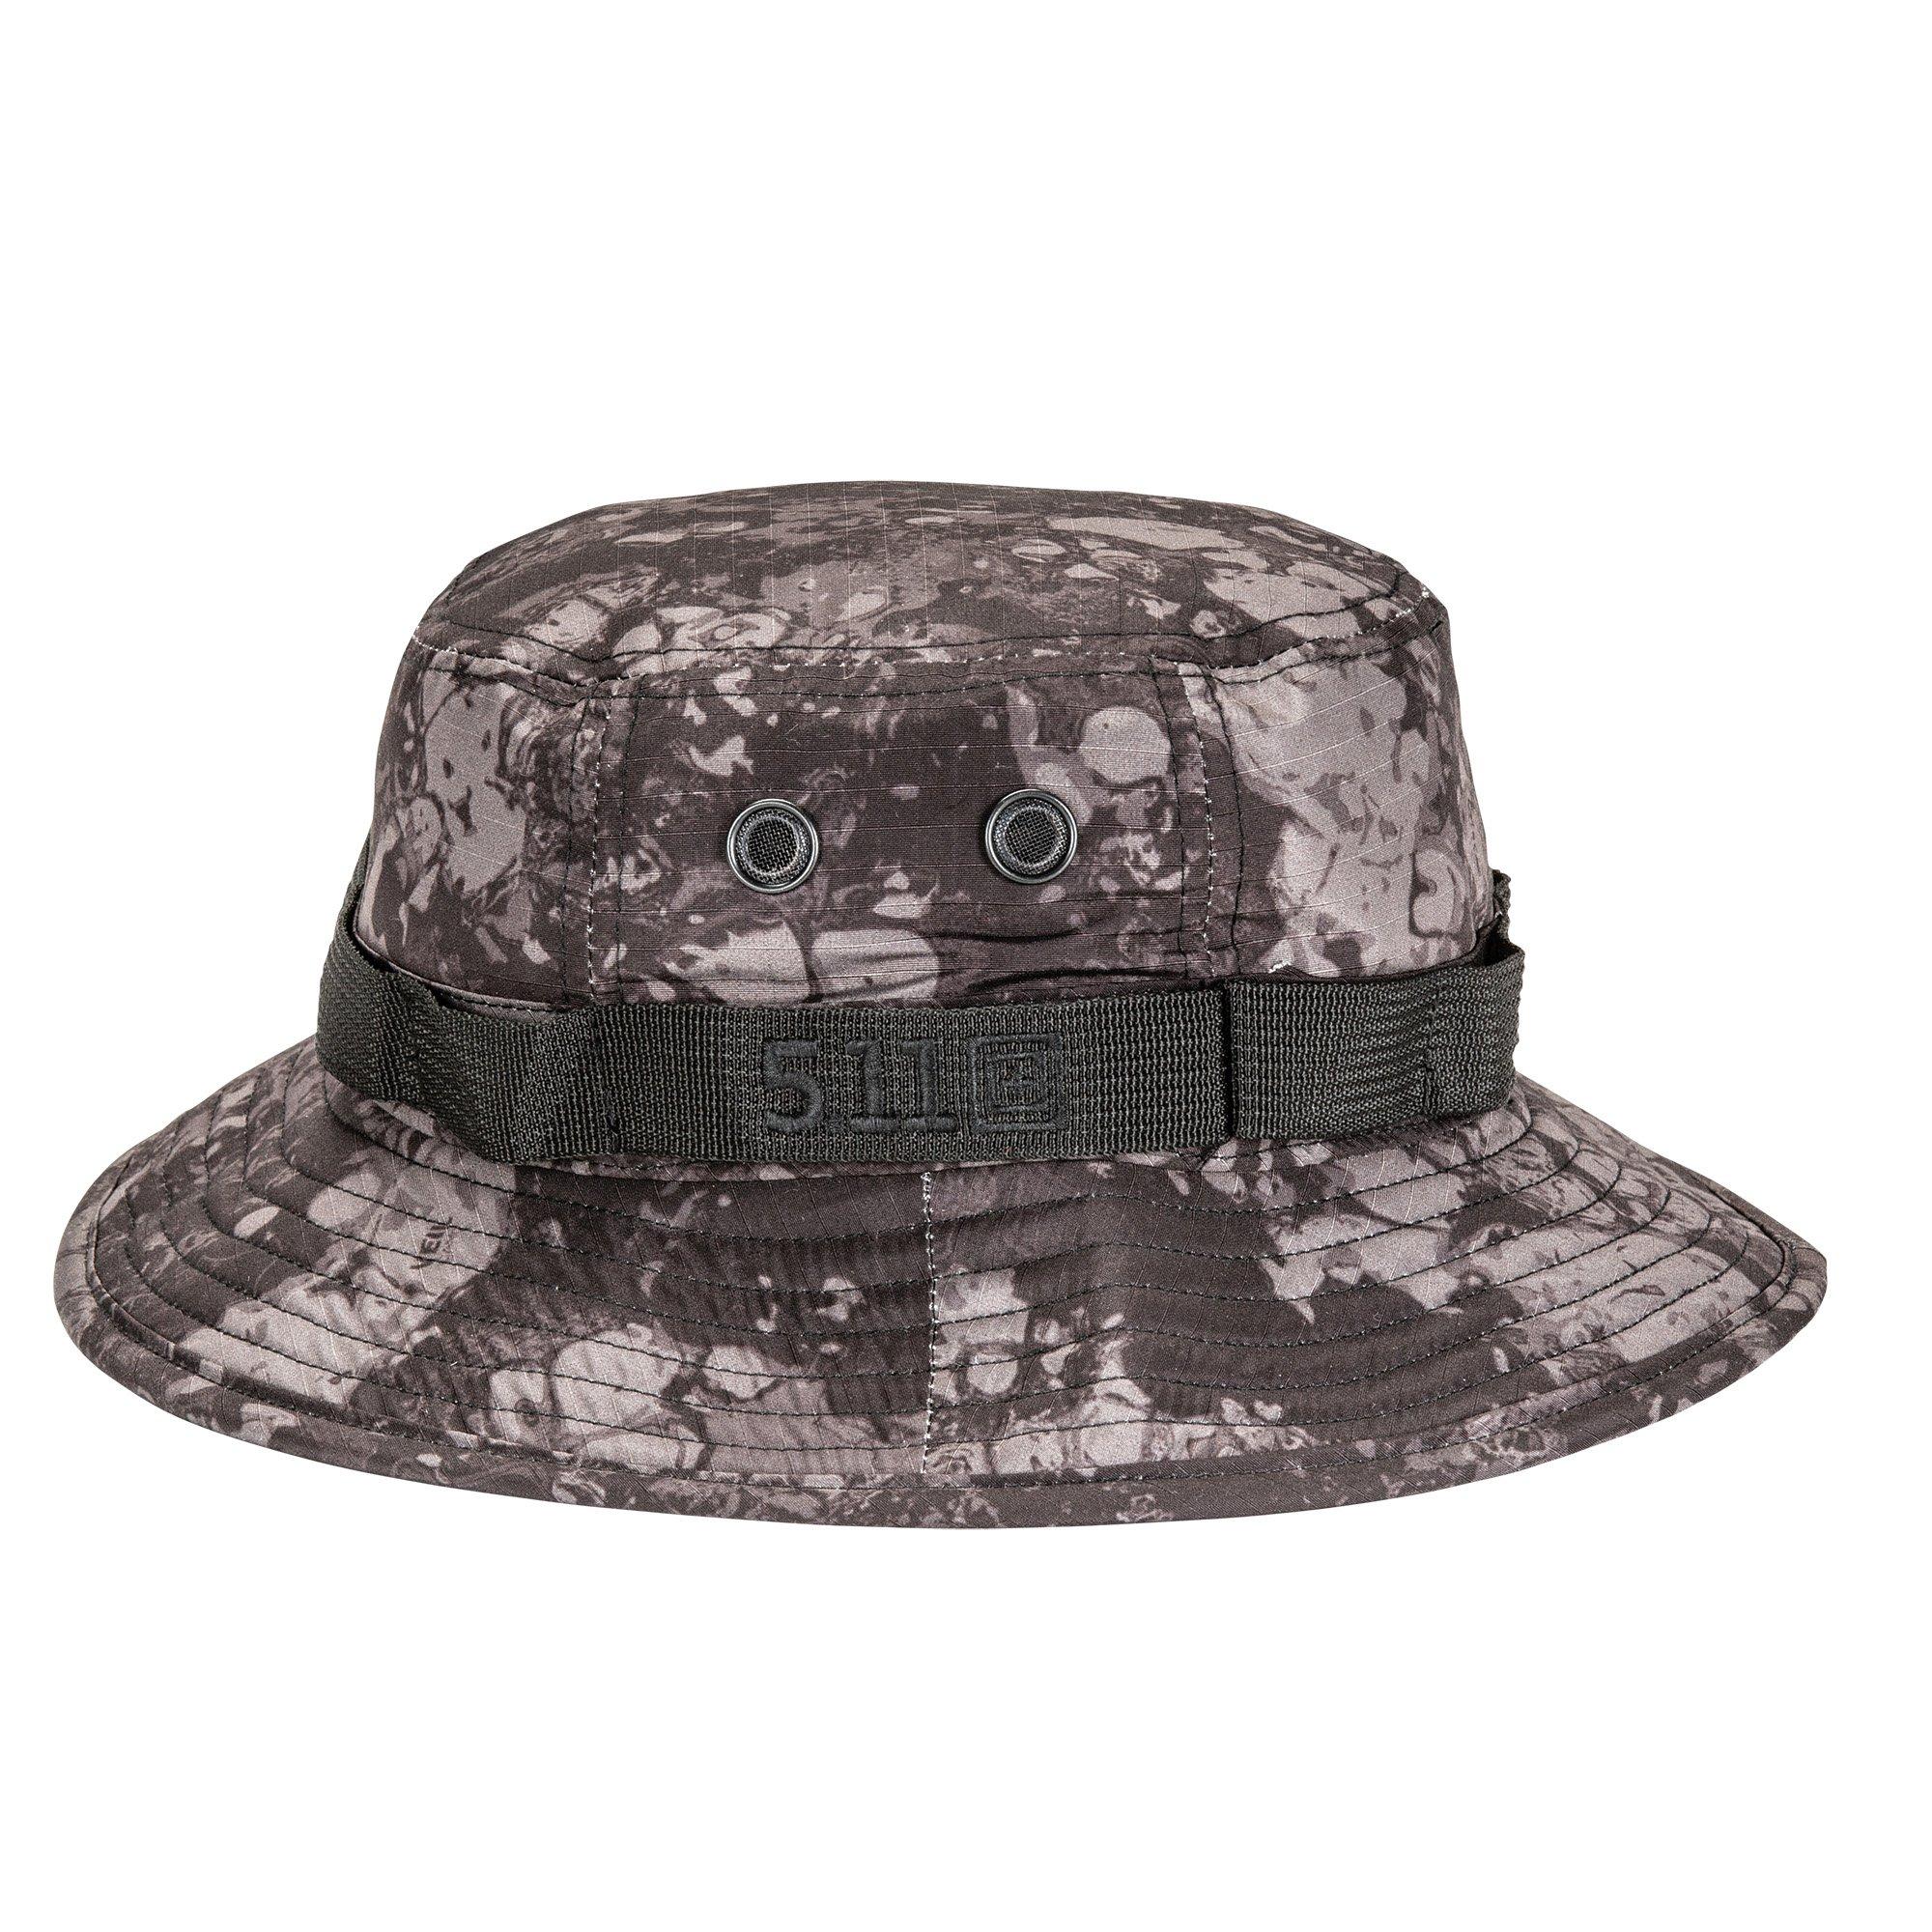 Nón 5.11 Tactical GEO7™ BOONIE HAT – Nigth